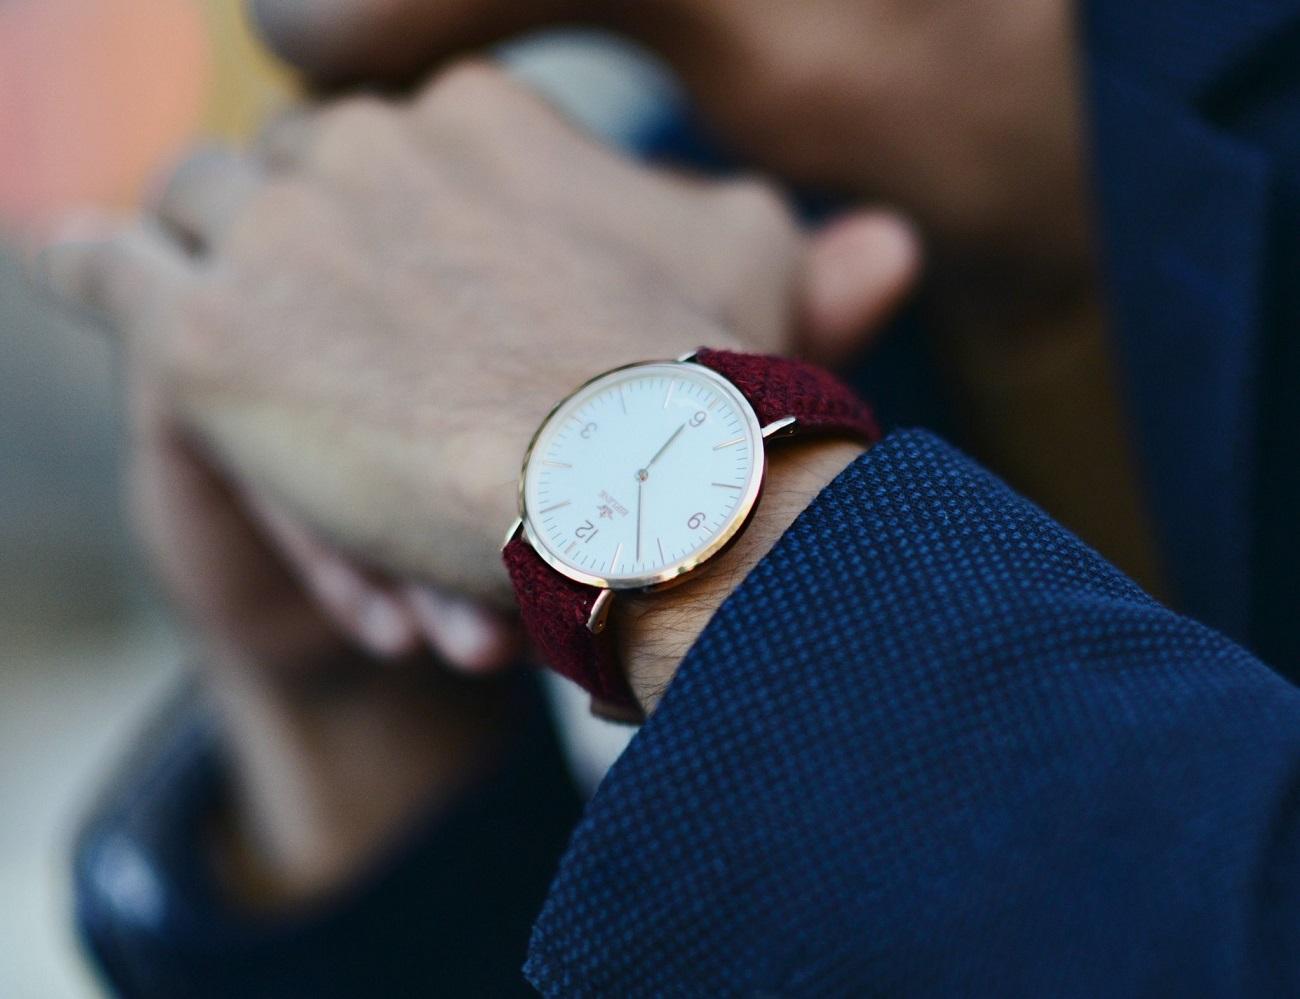 Birline+Watches+With+Harris+Tweed+Straps